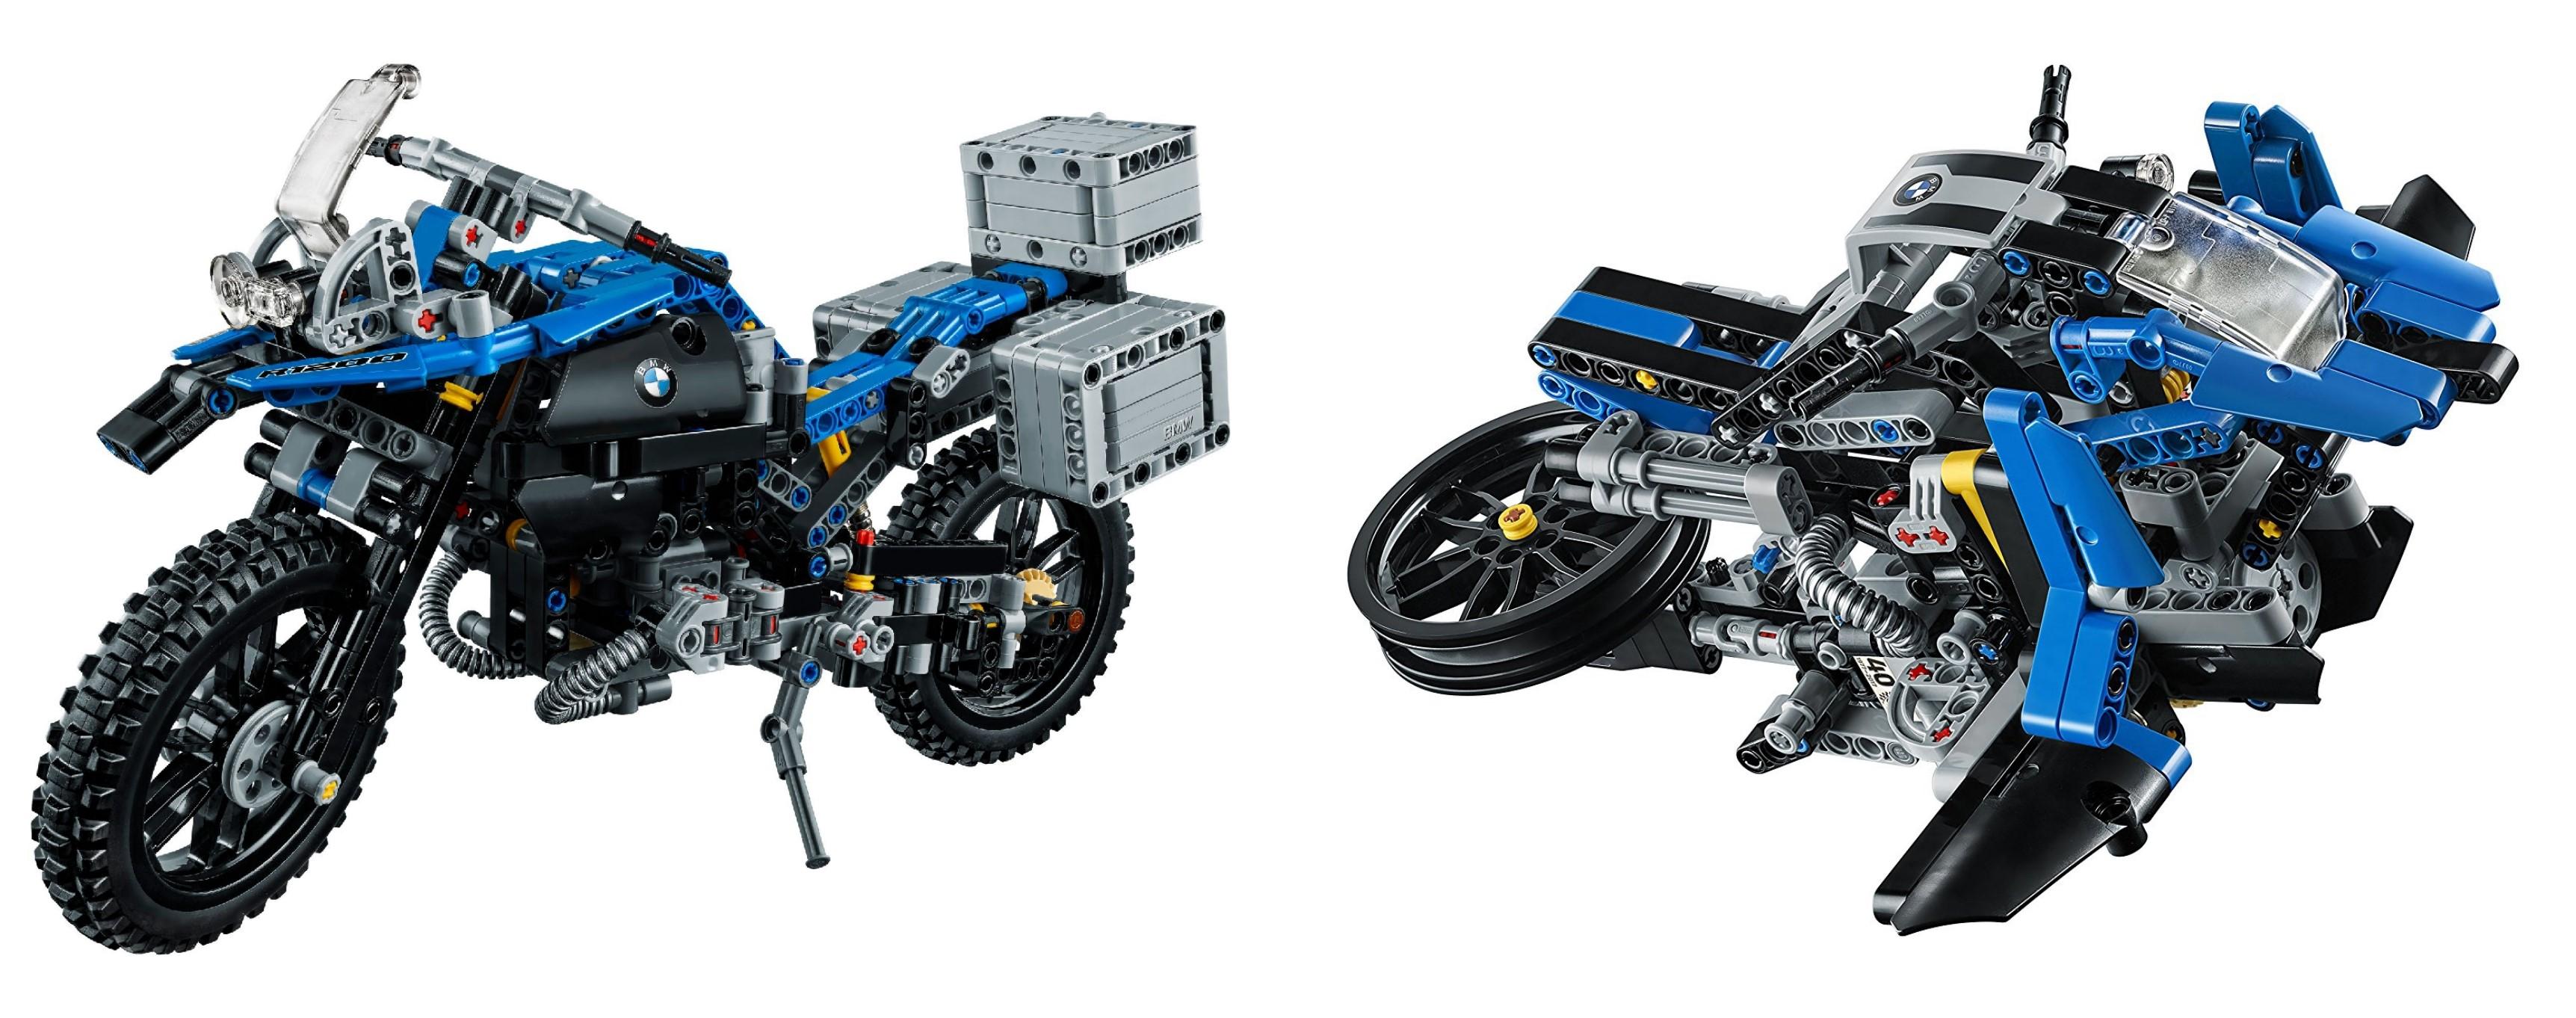 LEGO Technic Motorcycles bmw r1200